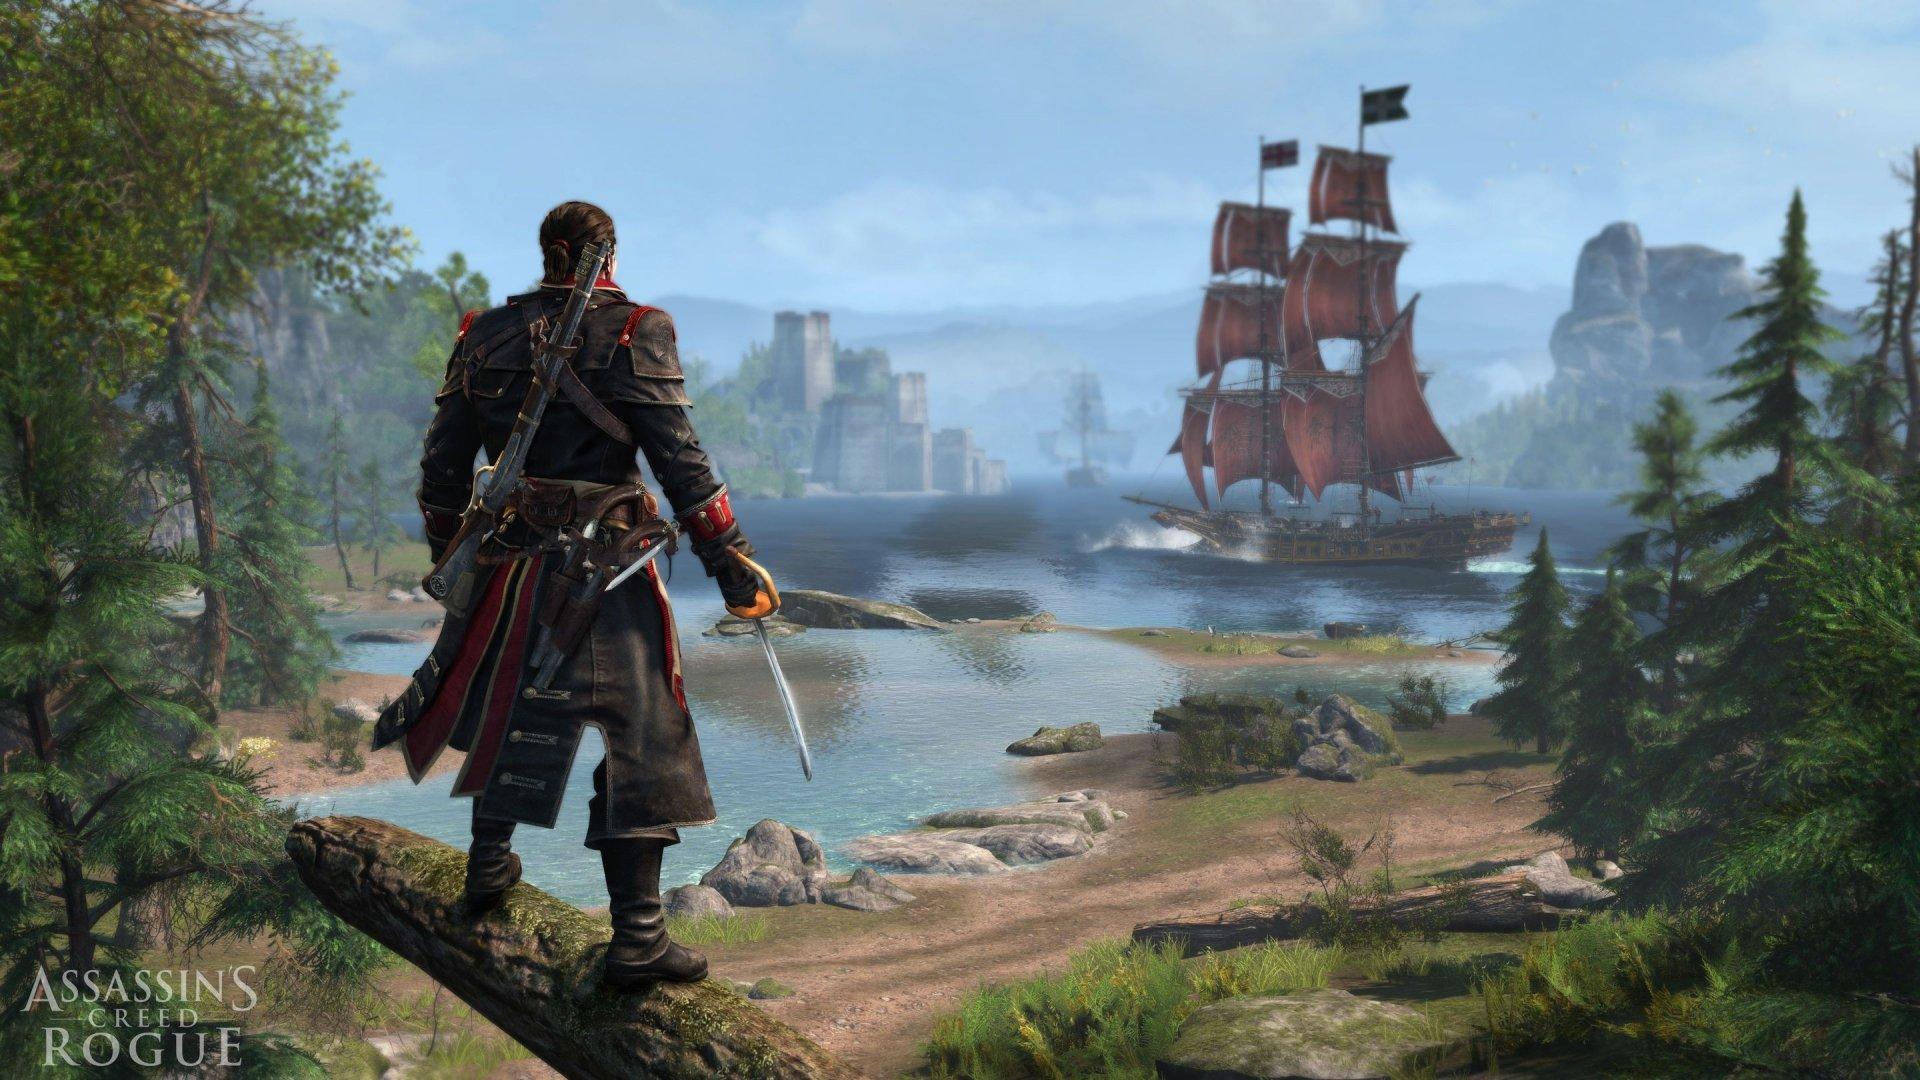 Assassin S Creed Rogue Wallpapers 1920x1080 Full Hd 1080p Desktop